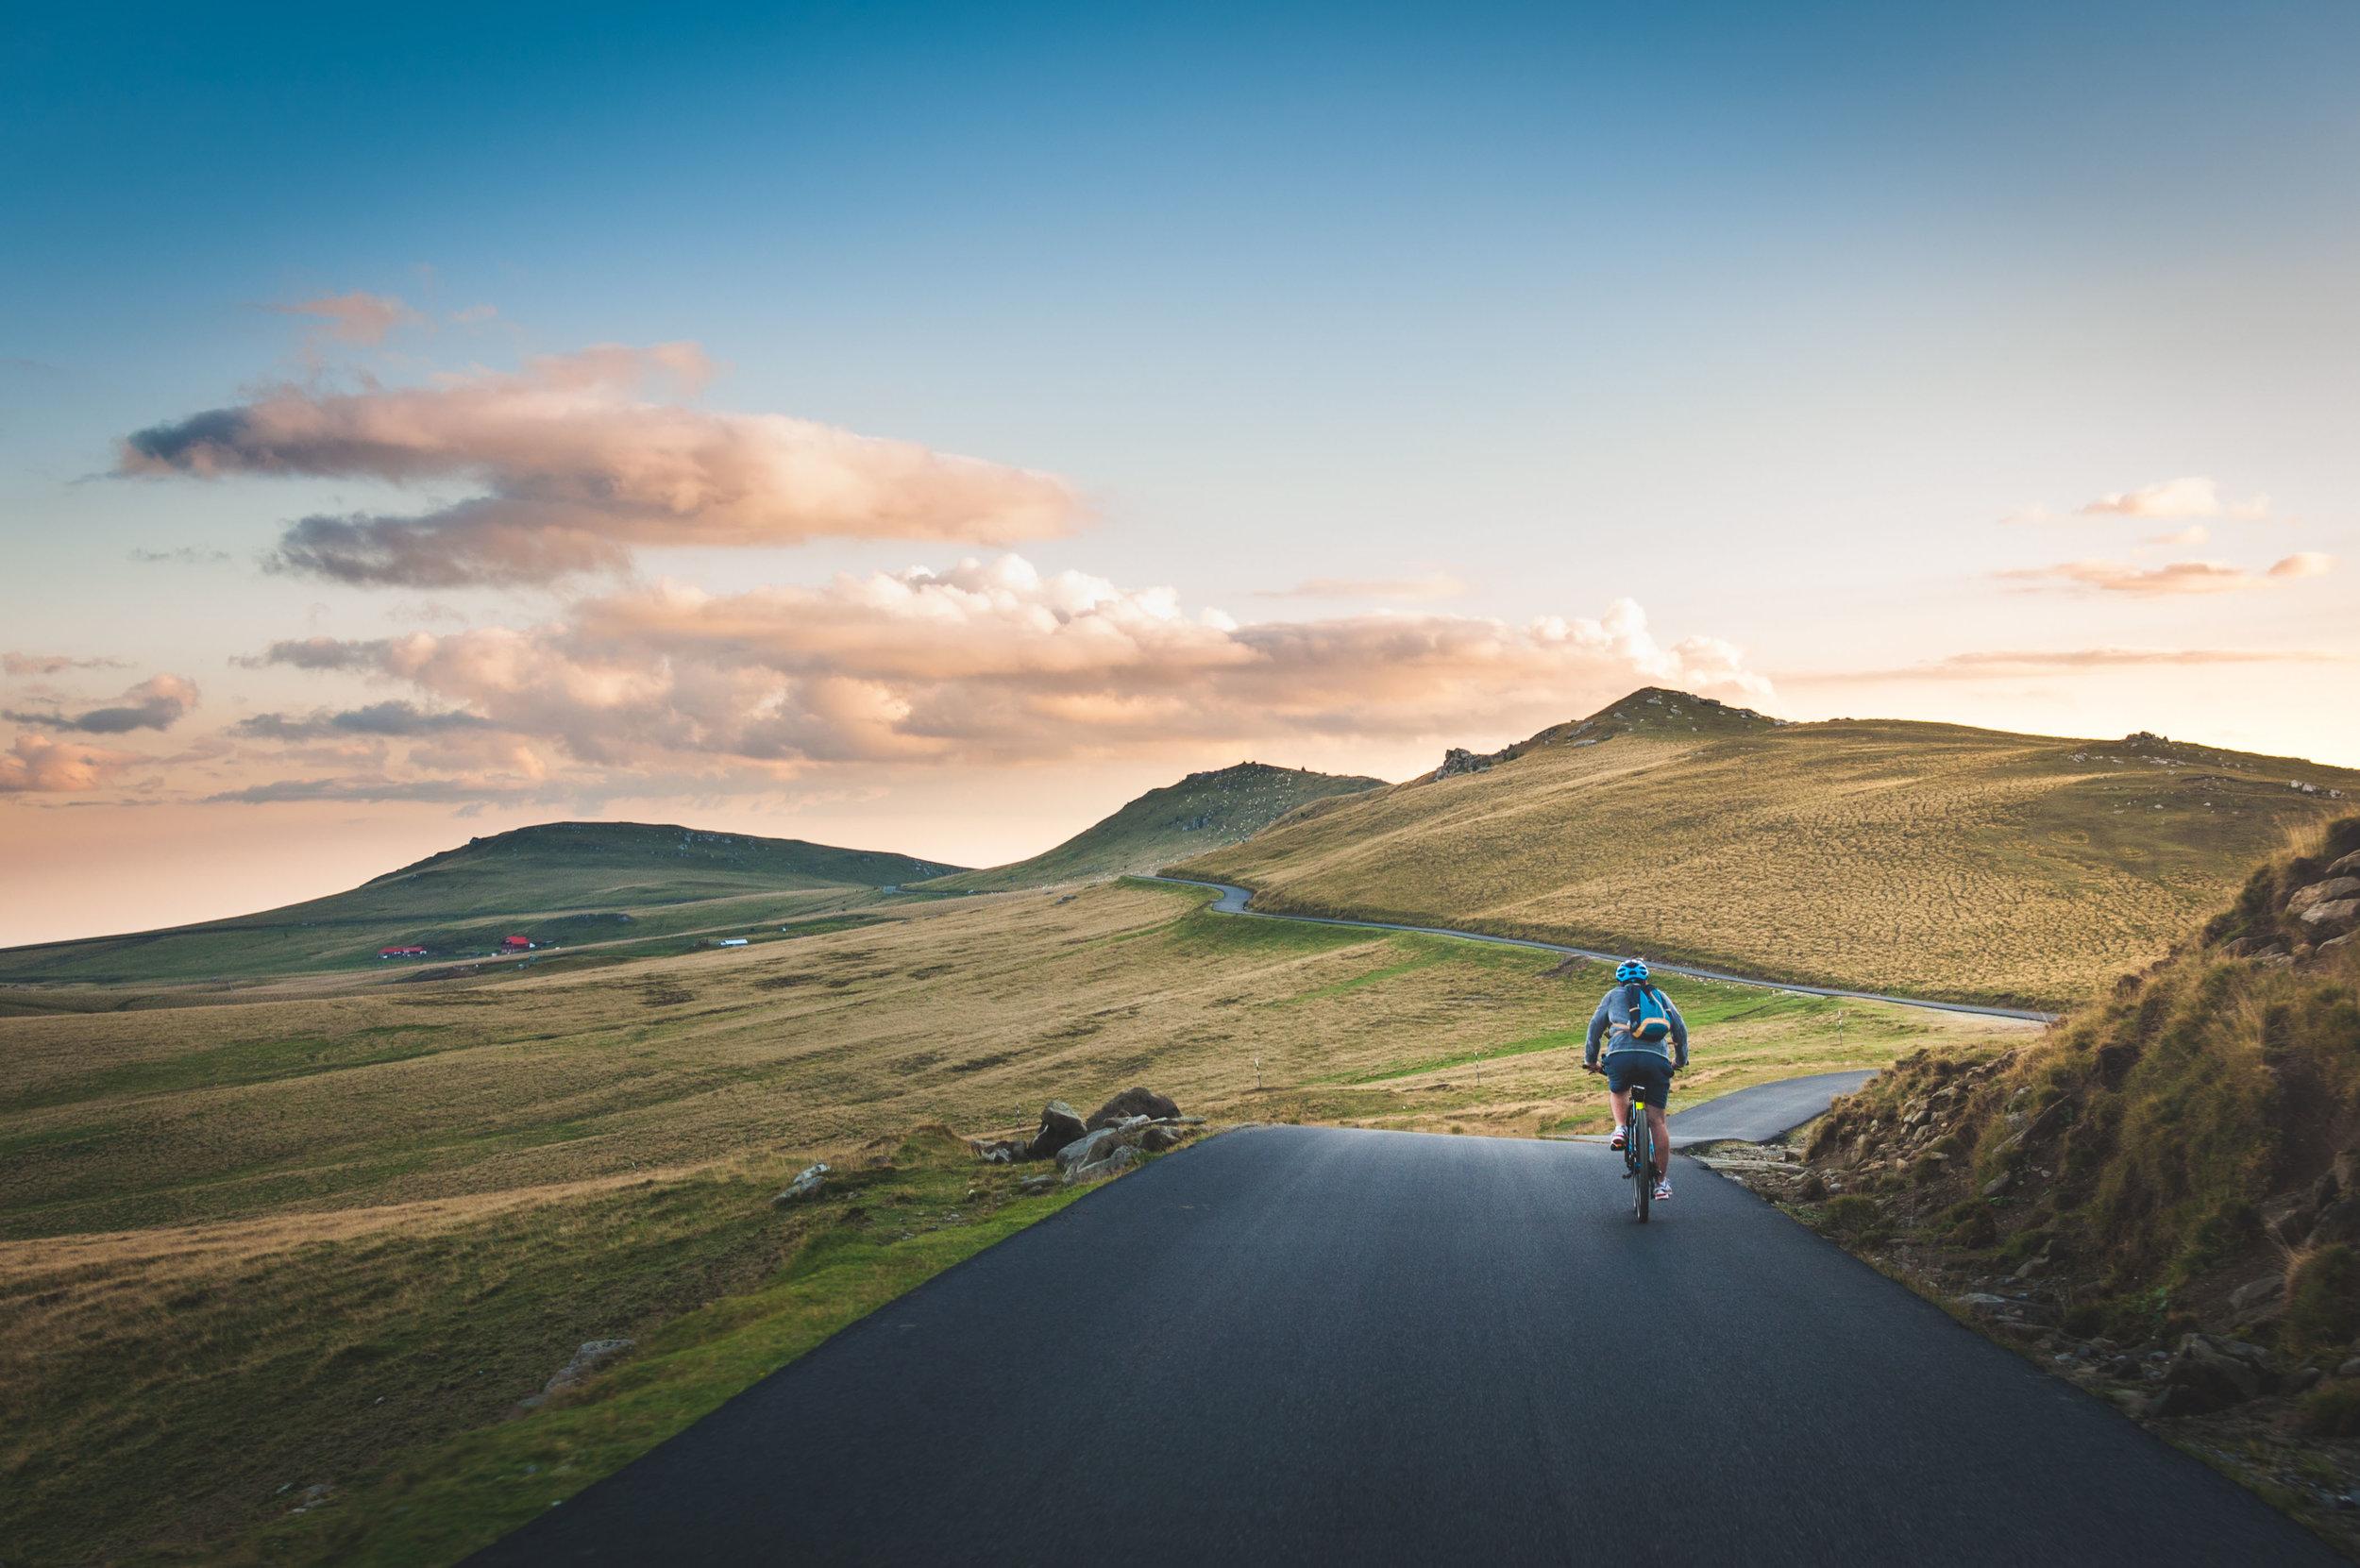 woman-on-bike-improving-her-life